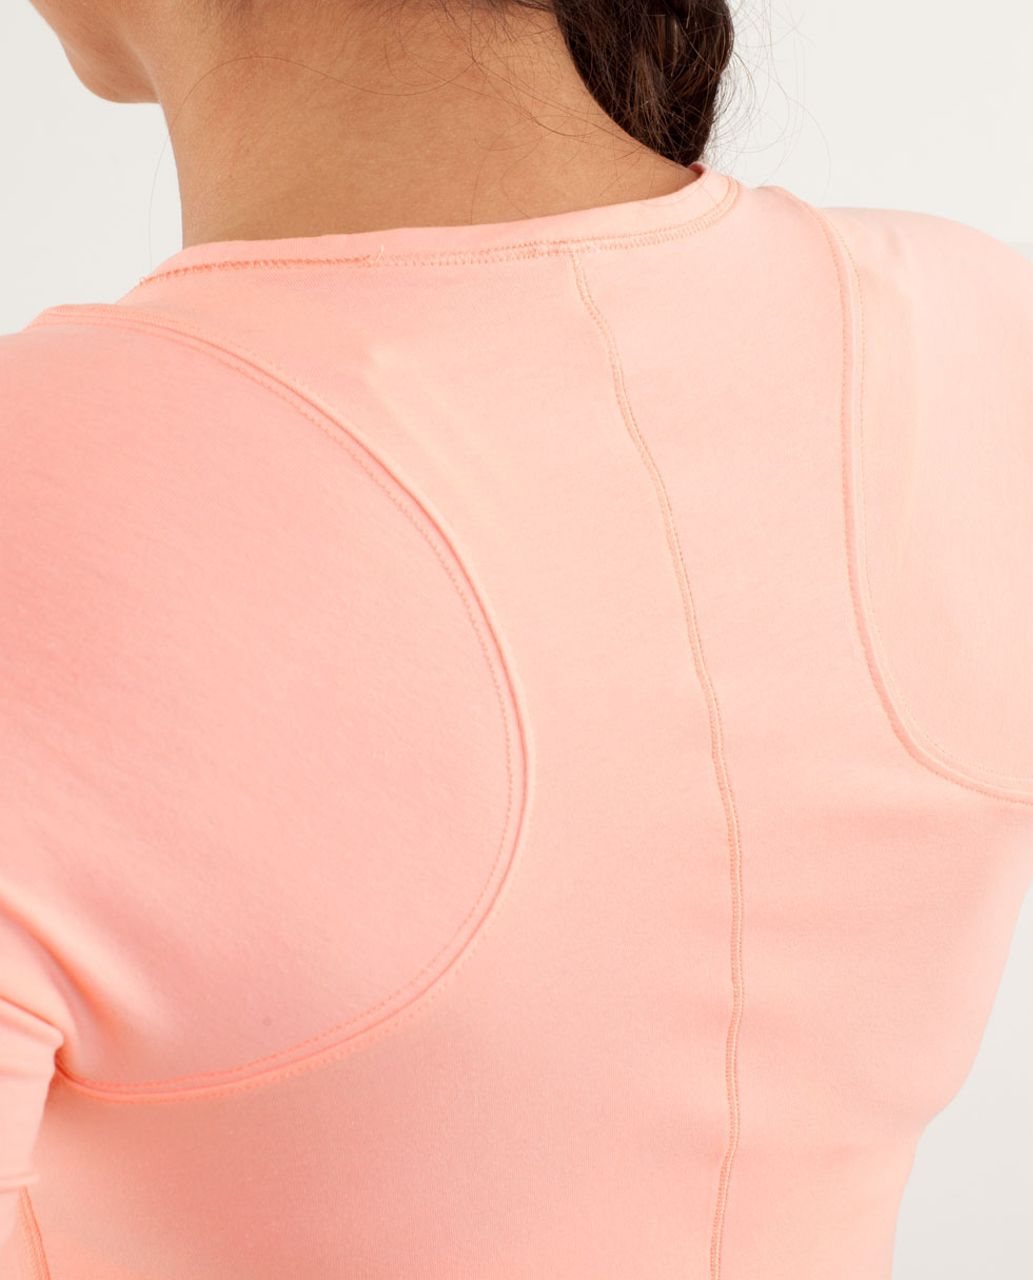 Lululemon Clari-Tee Short Sleeve - Bleached Coral